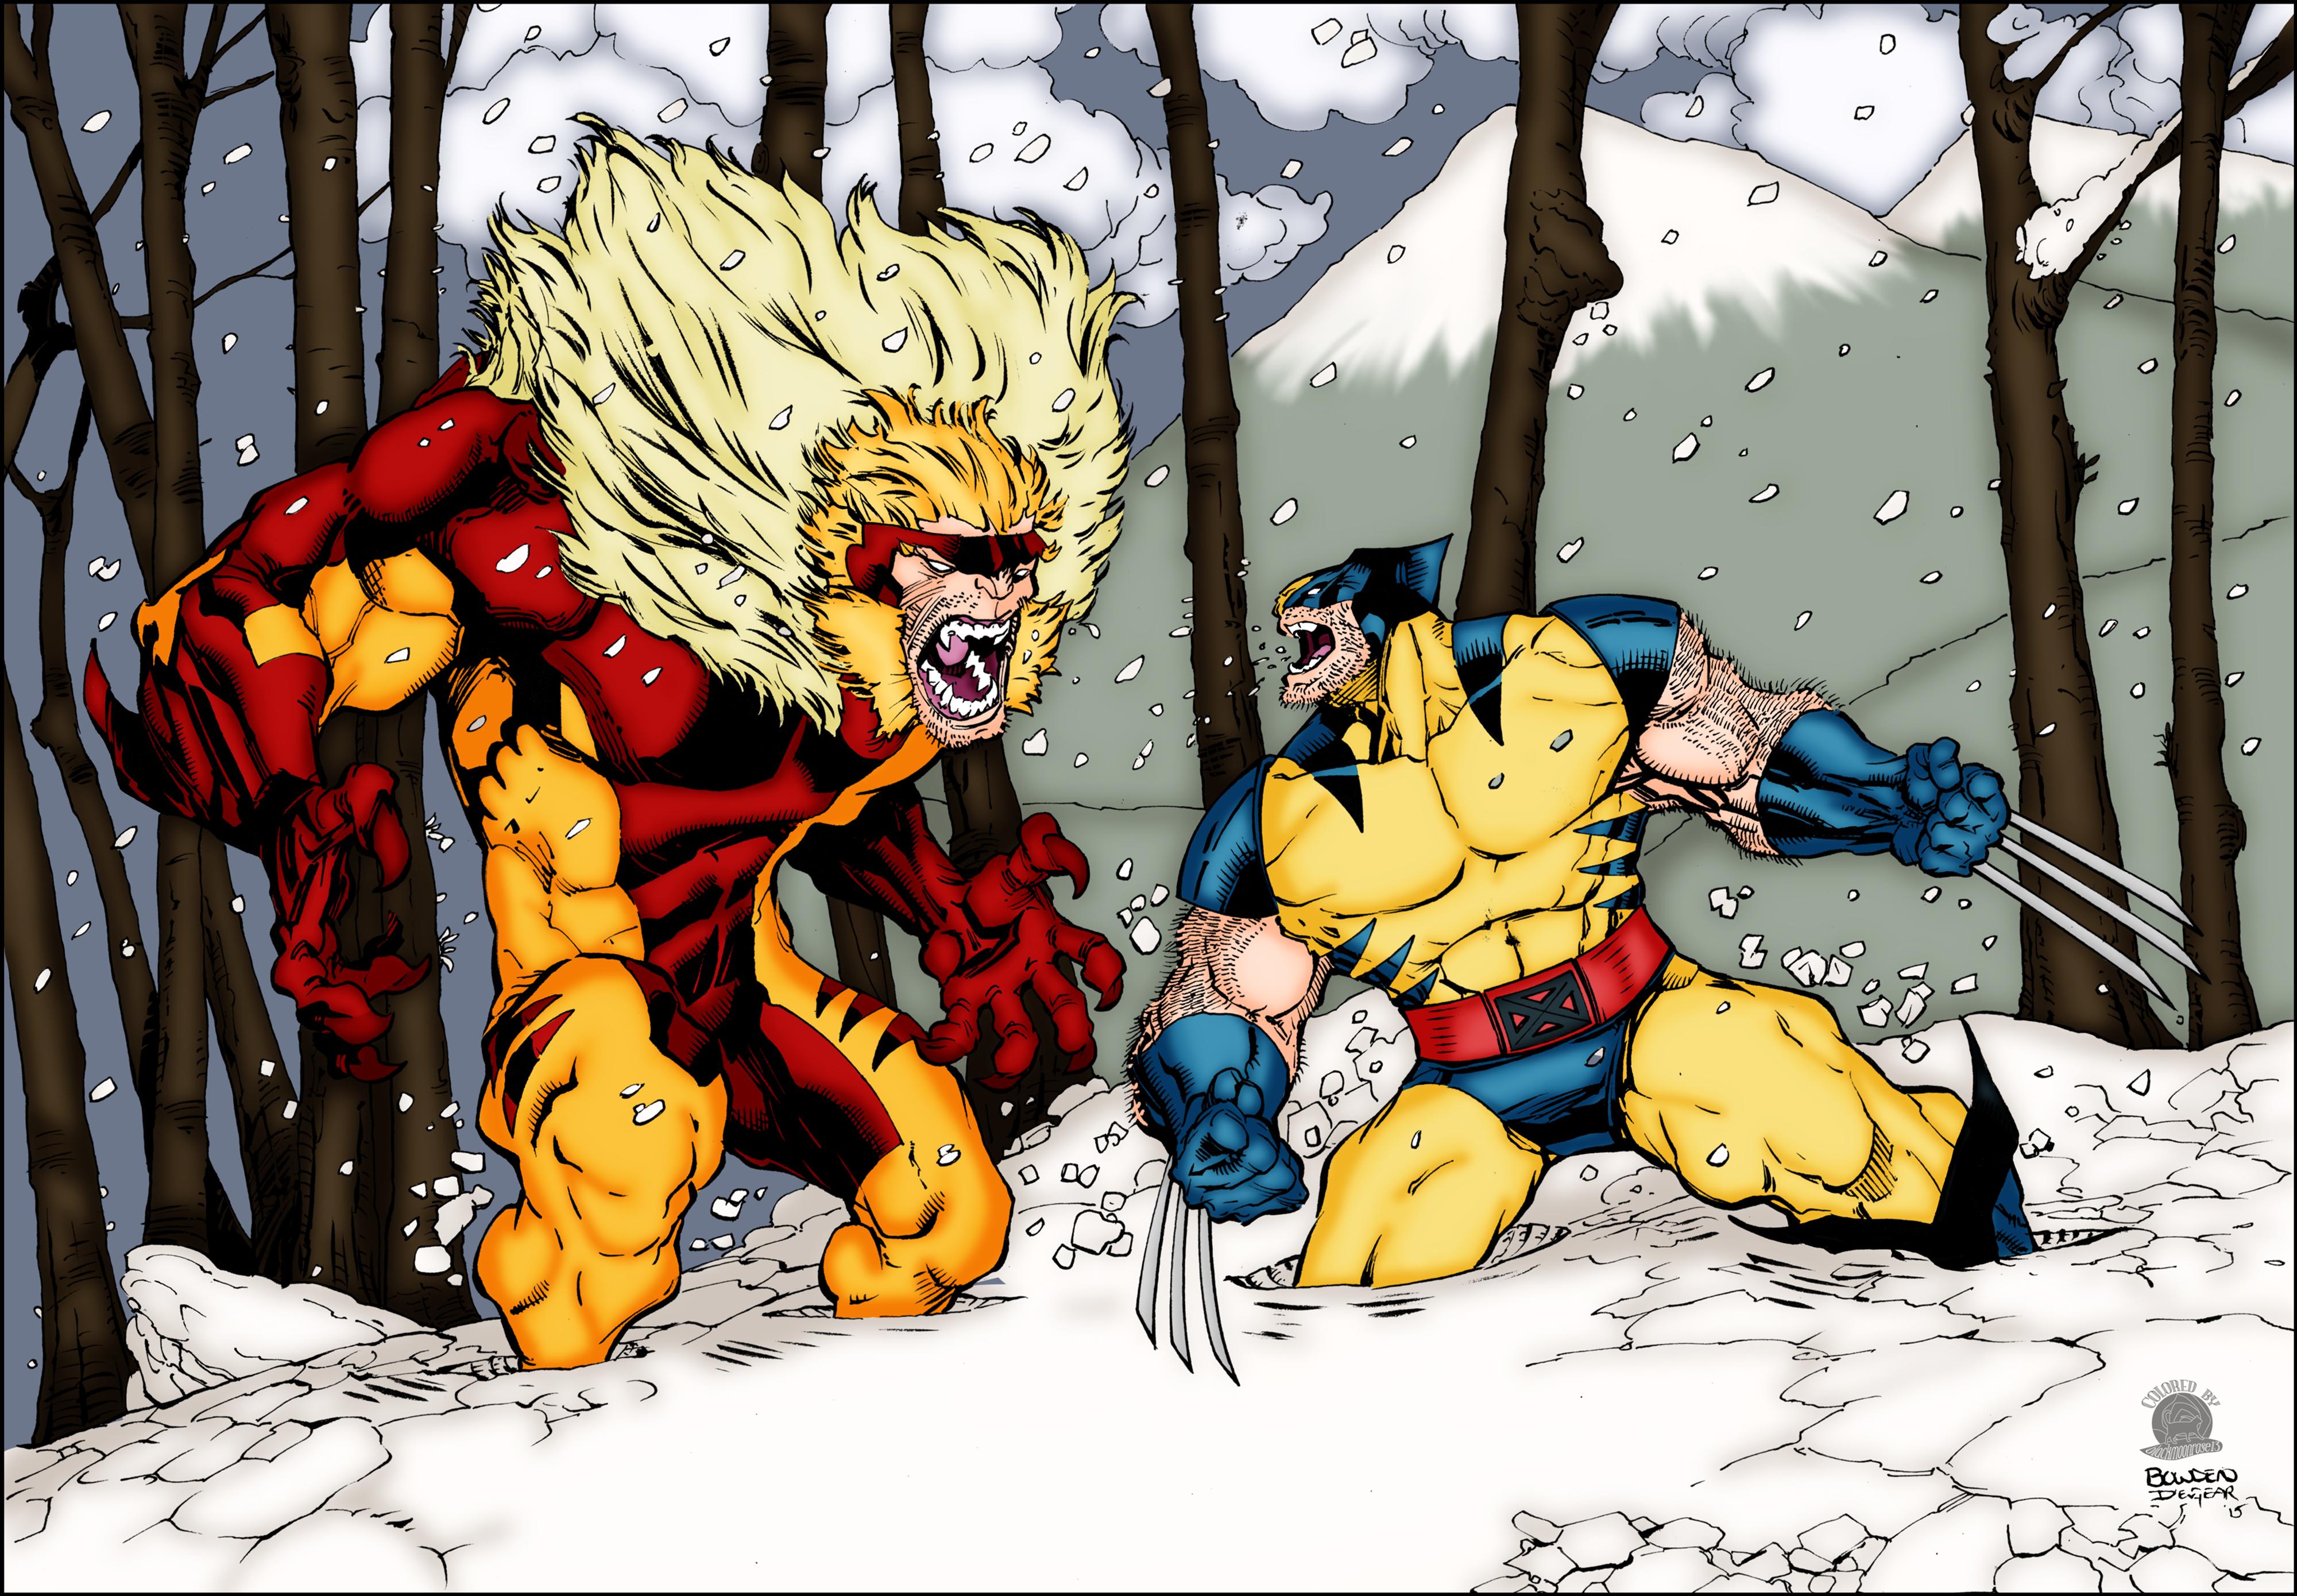 c8dba593b00 Wolverine vs Sabretooth — Weasyl